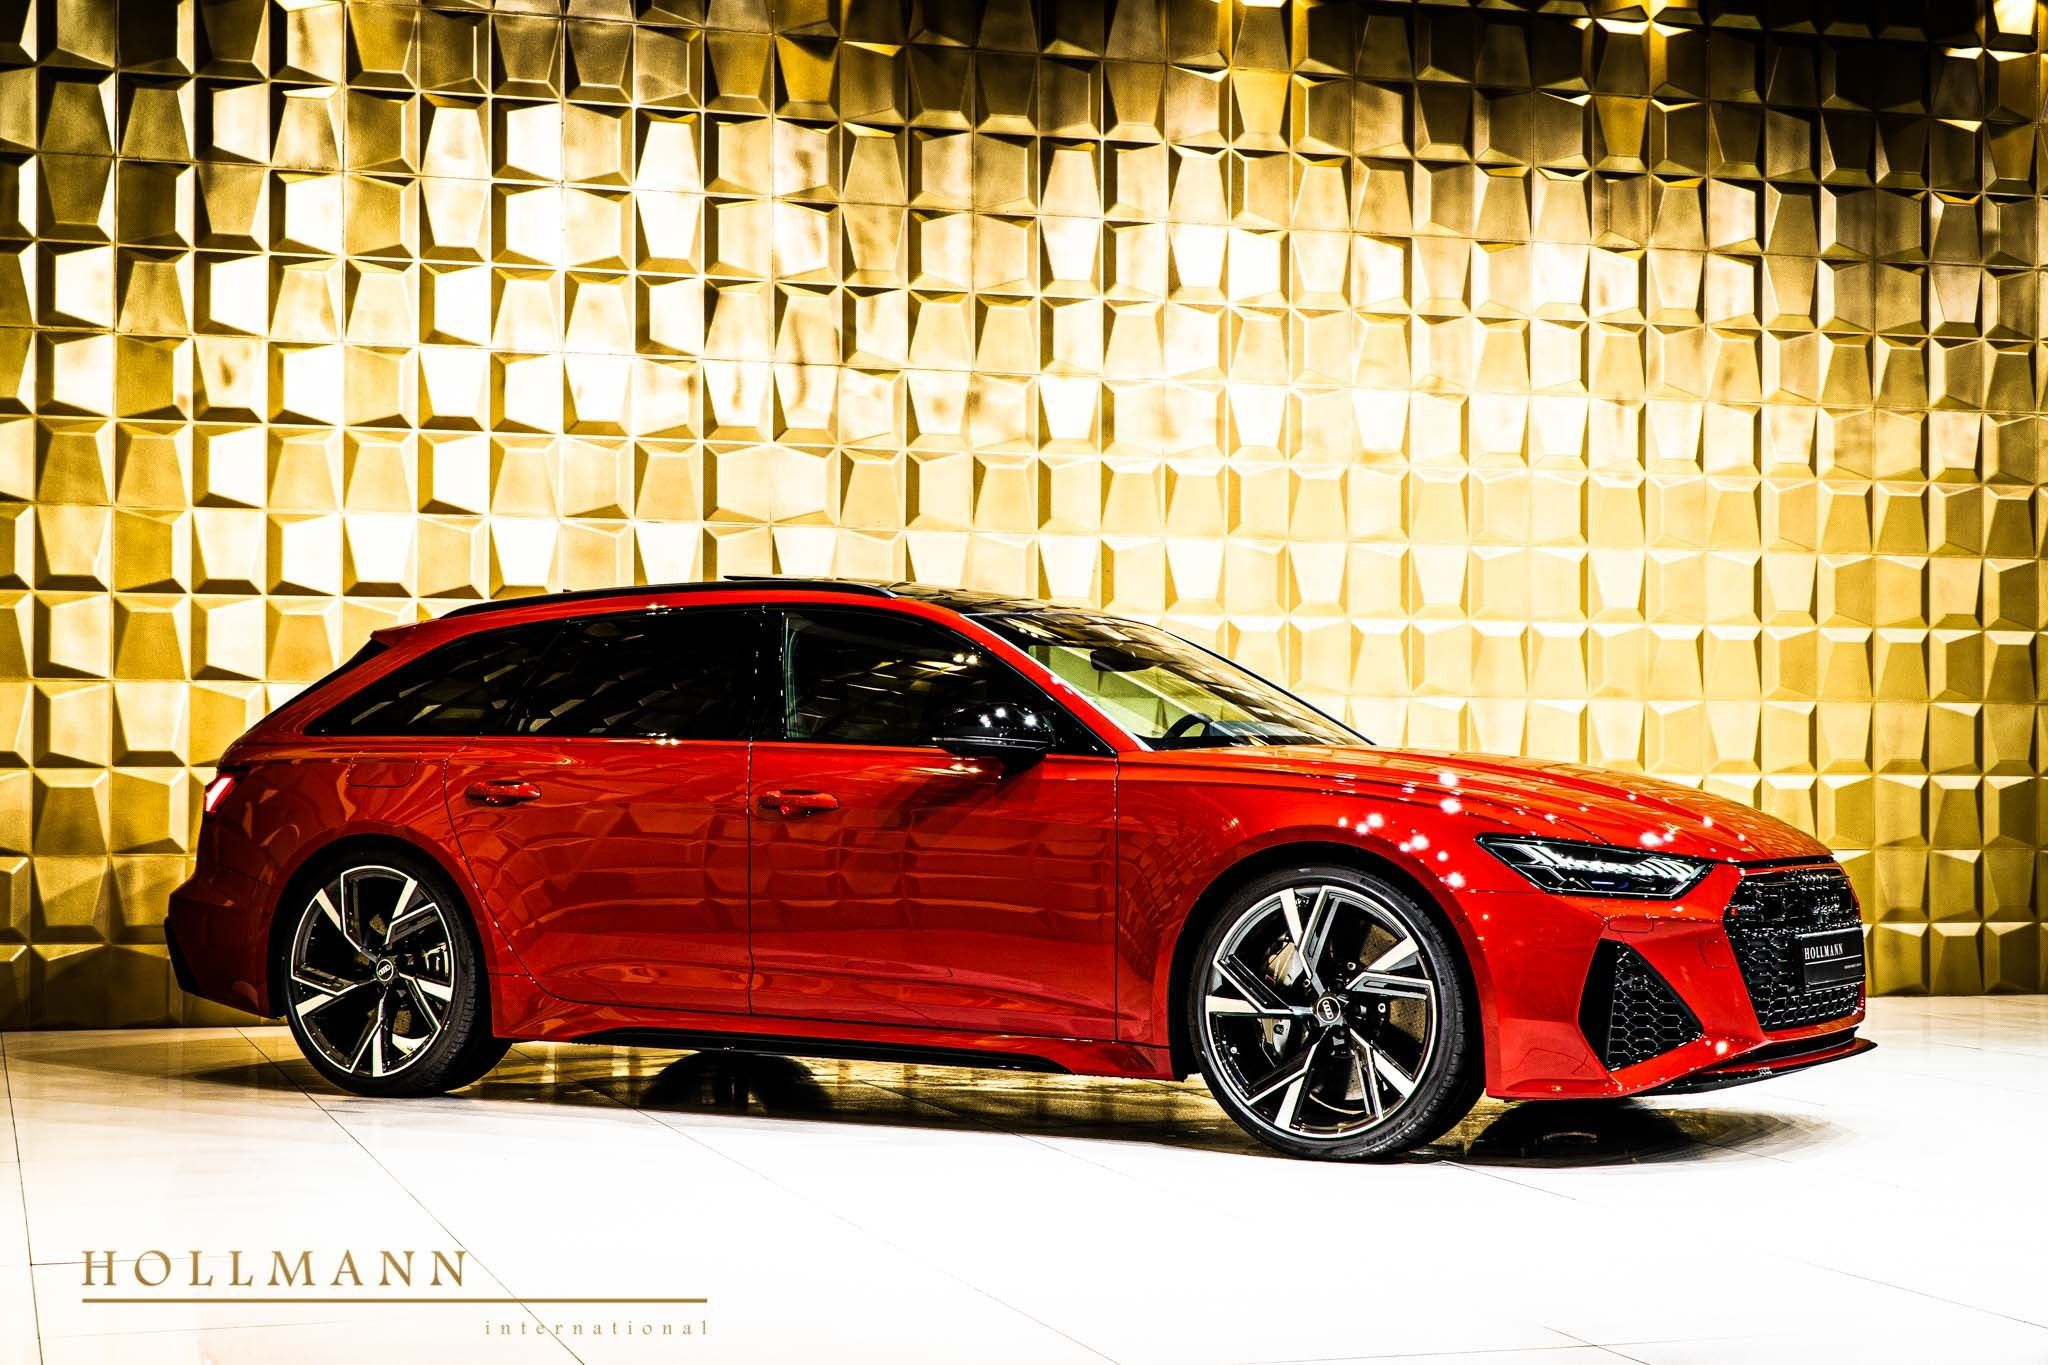 Audi Rs6 Avant Hollmann International Germany For Sale On Luxurypulse En 2020 Rs6